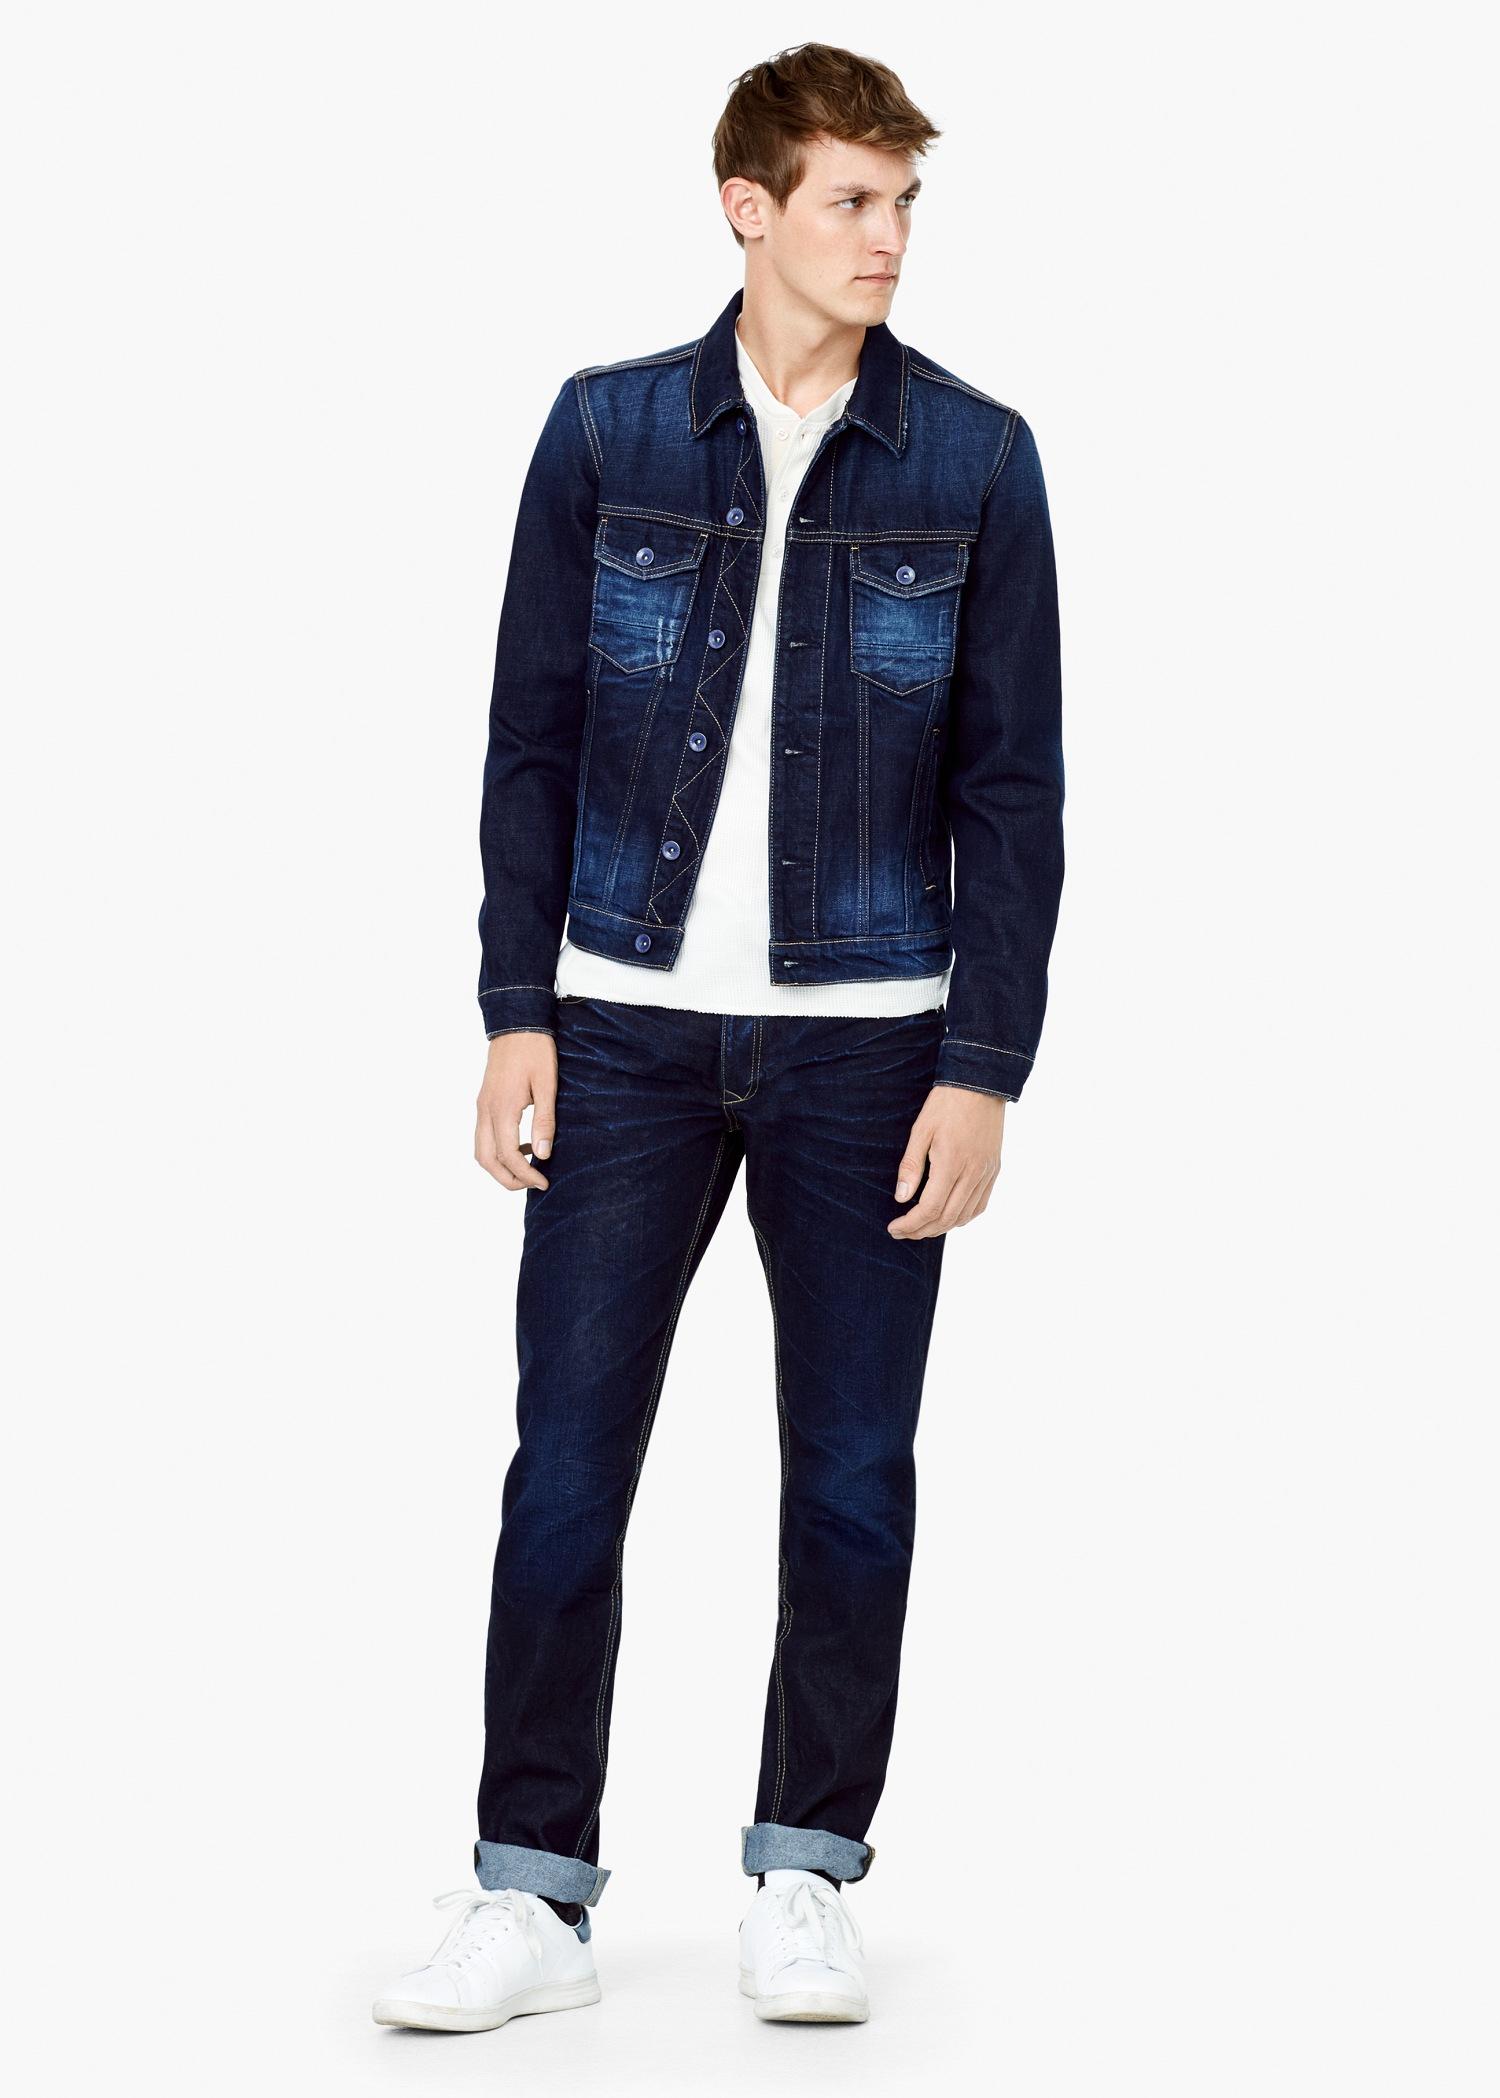 Lyst - Mango Dark Wash Denim Jacket in Blue for Men 2aa0401a5